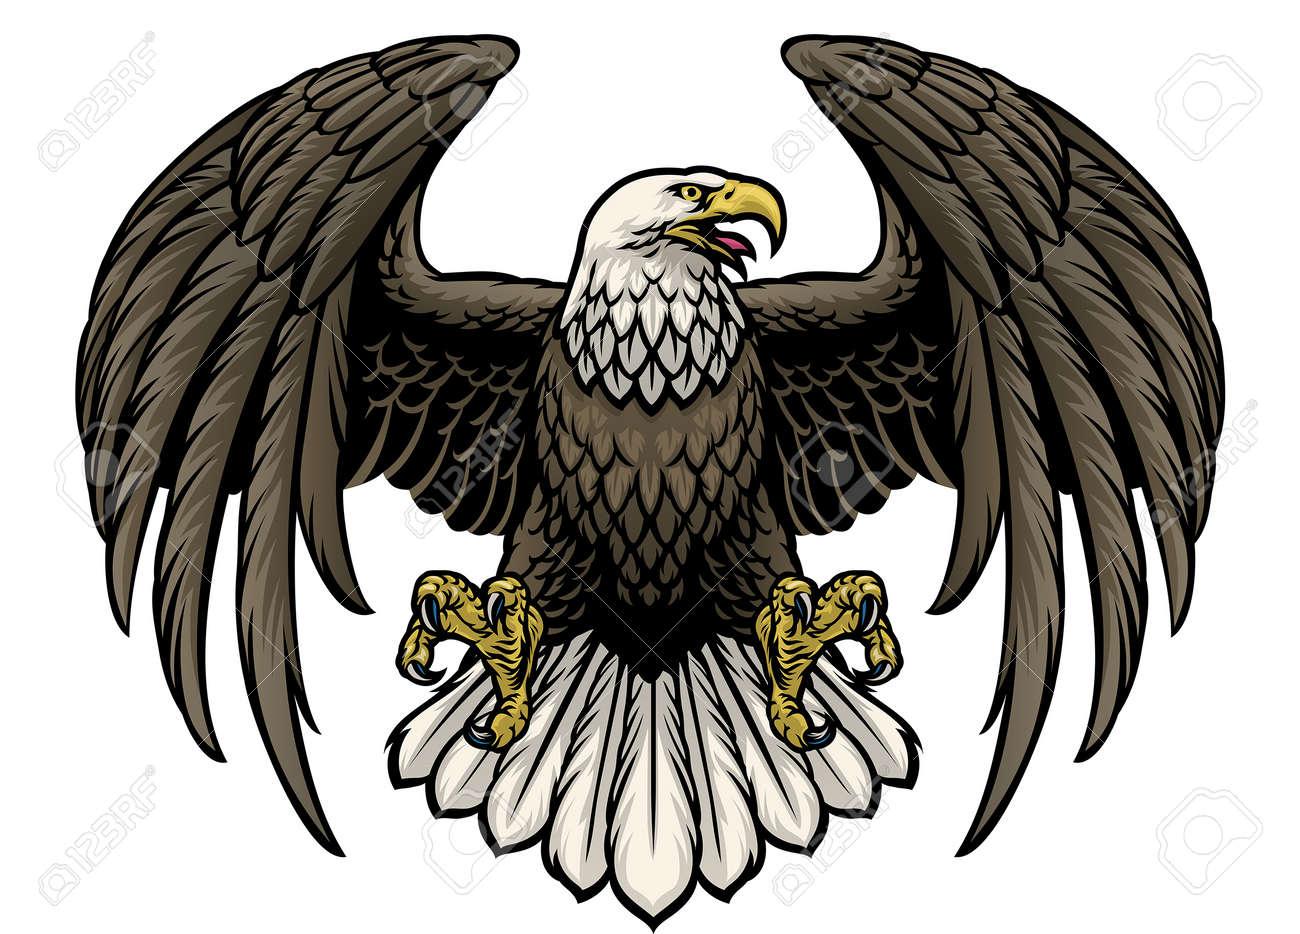 vector of hand drawn bald eagle - 171104015